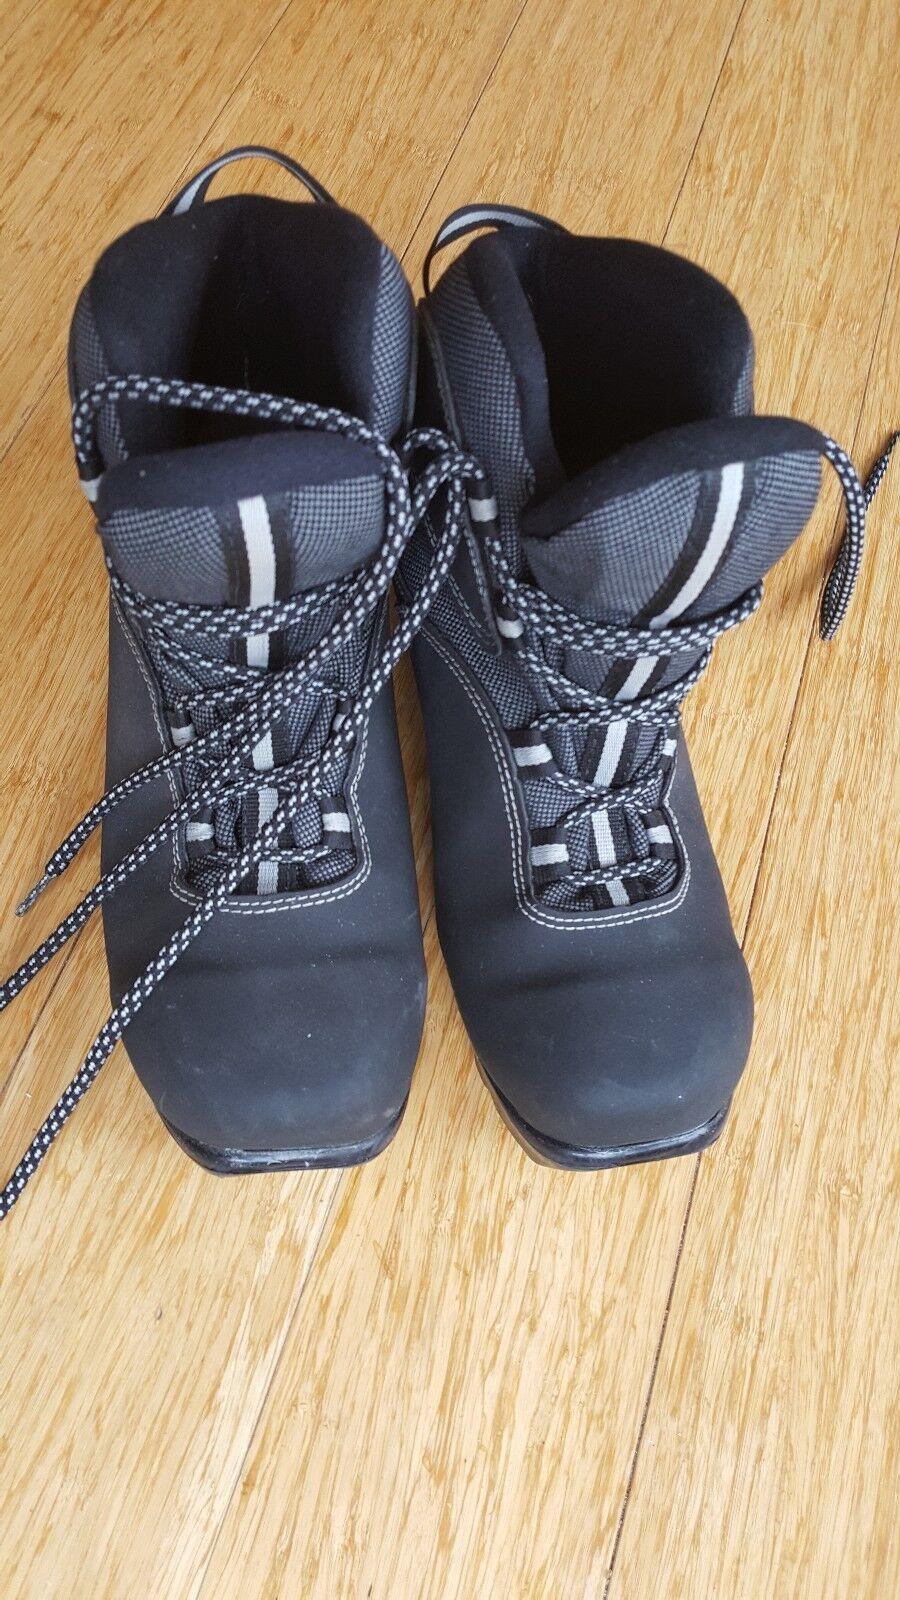 Rossignol X-country Ski Boots Size 6.5 Women NNN